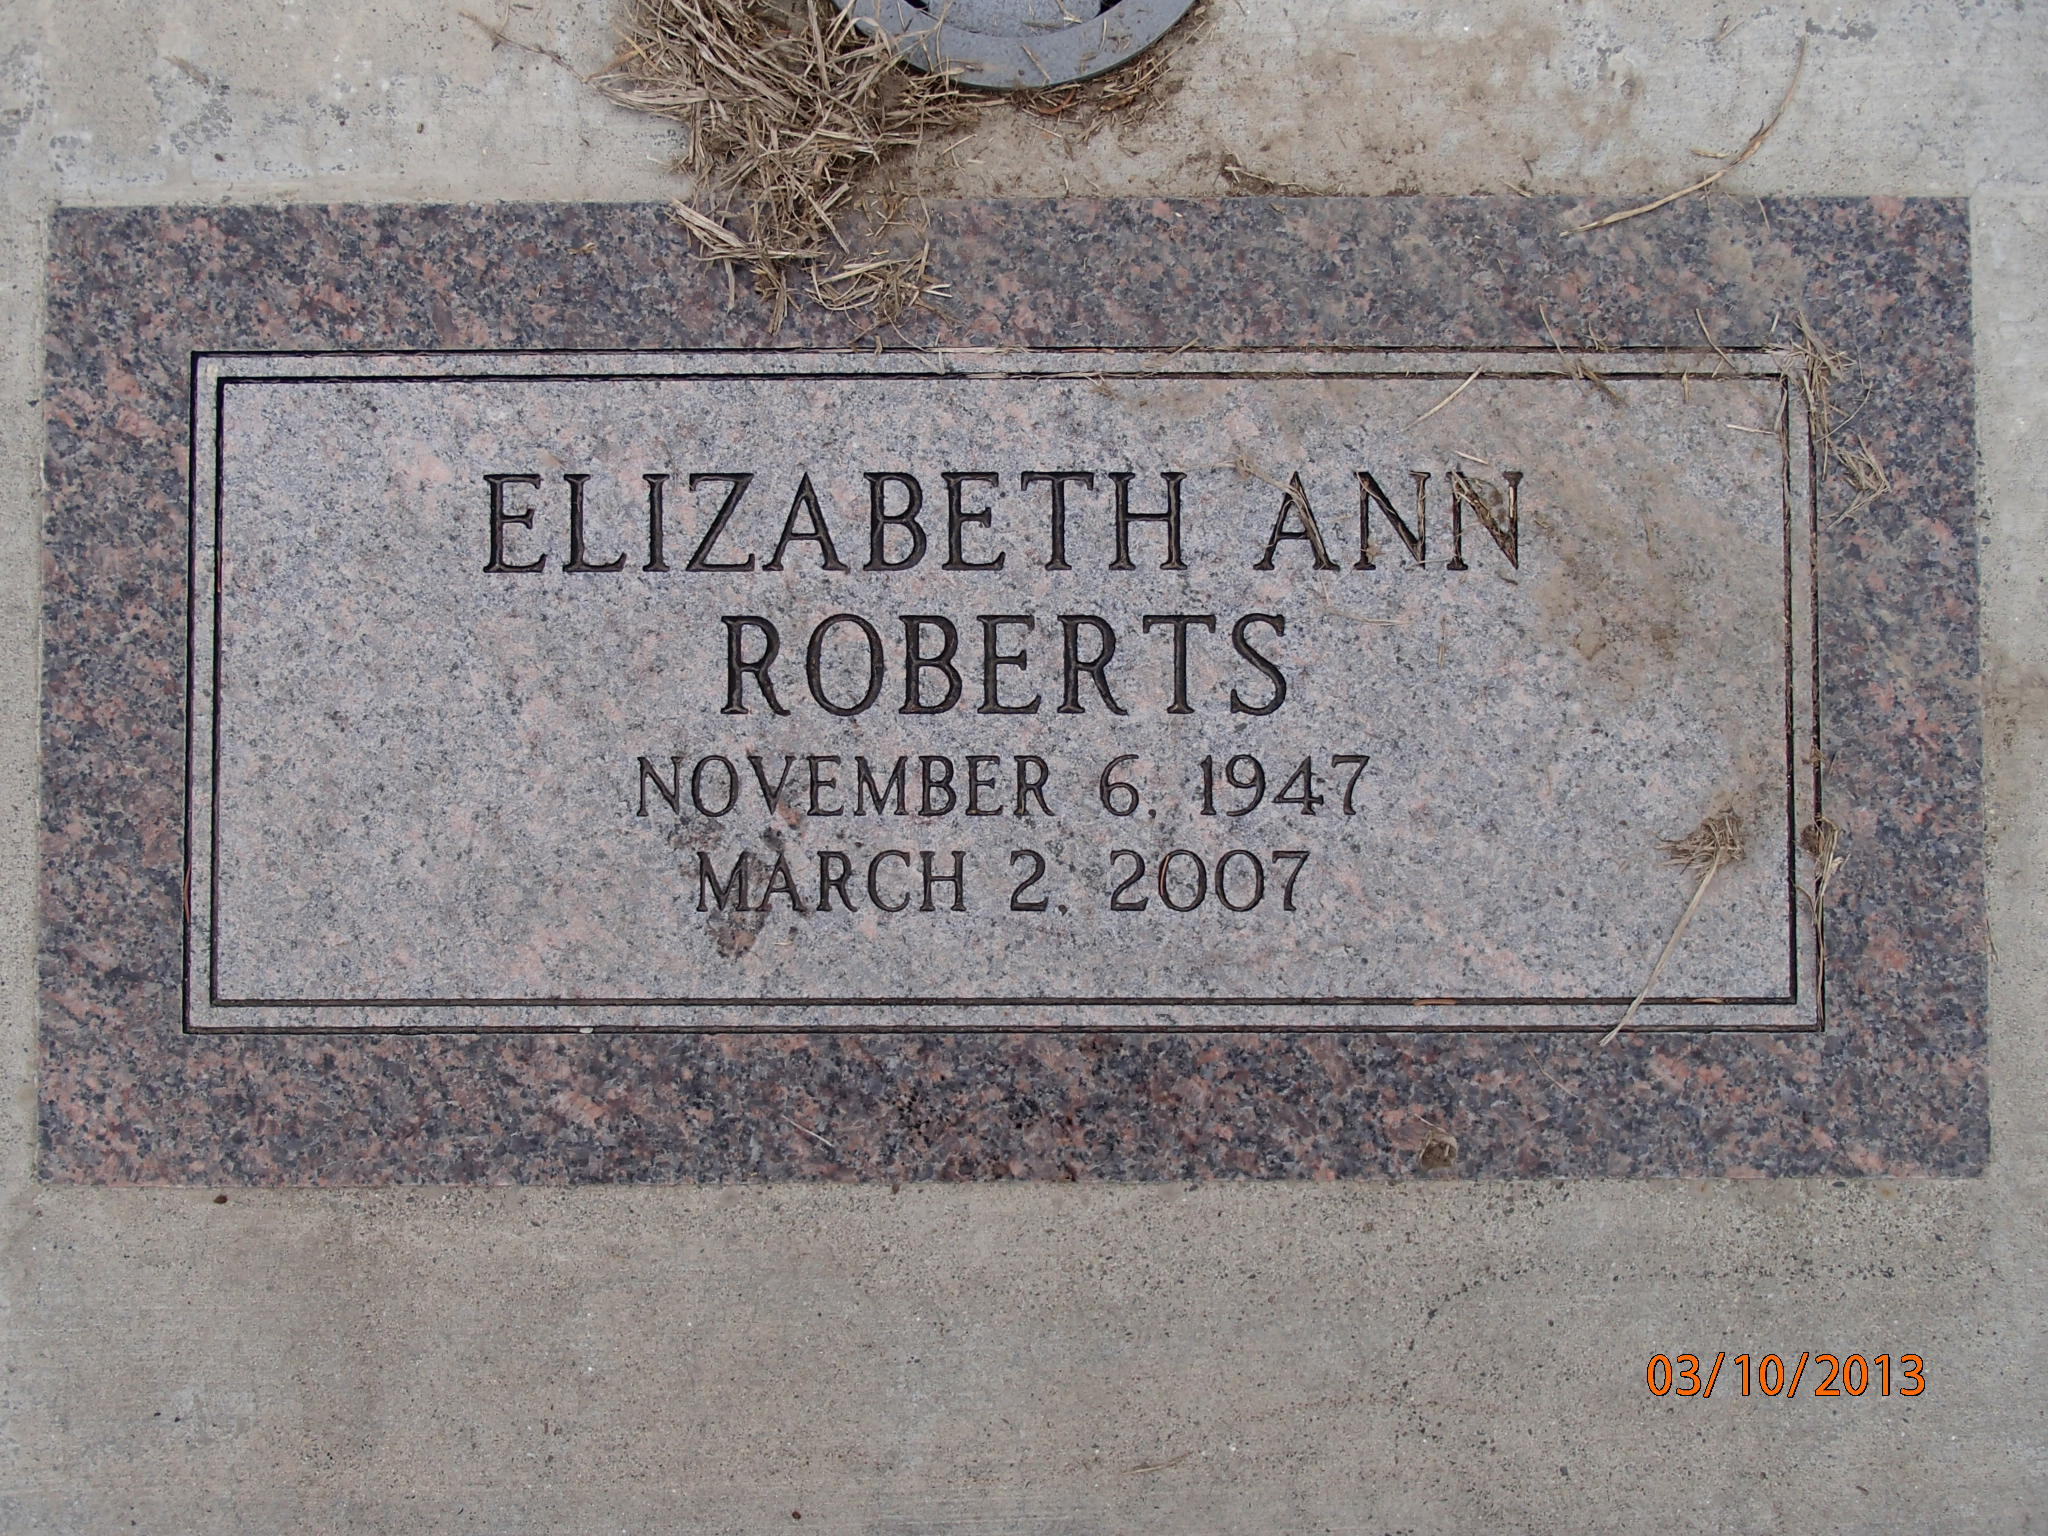 Elizabeth ann roberts phrase